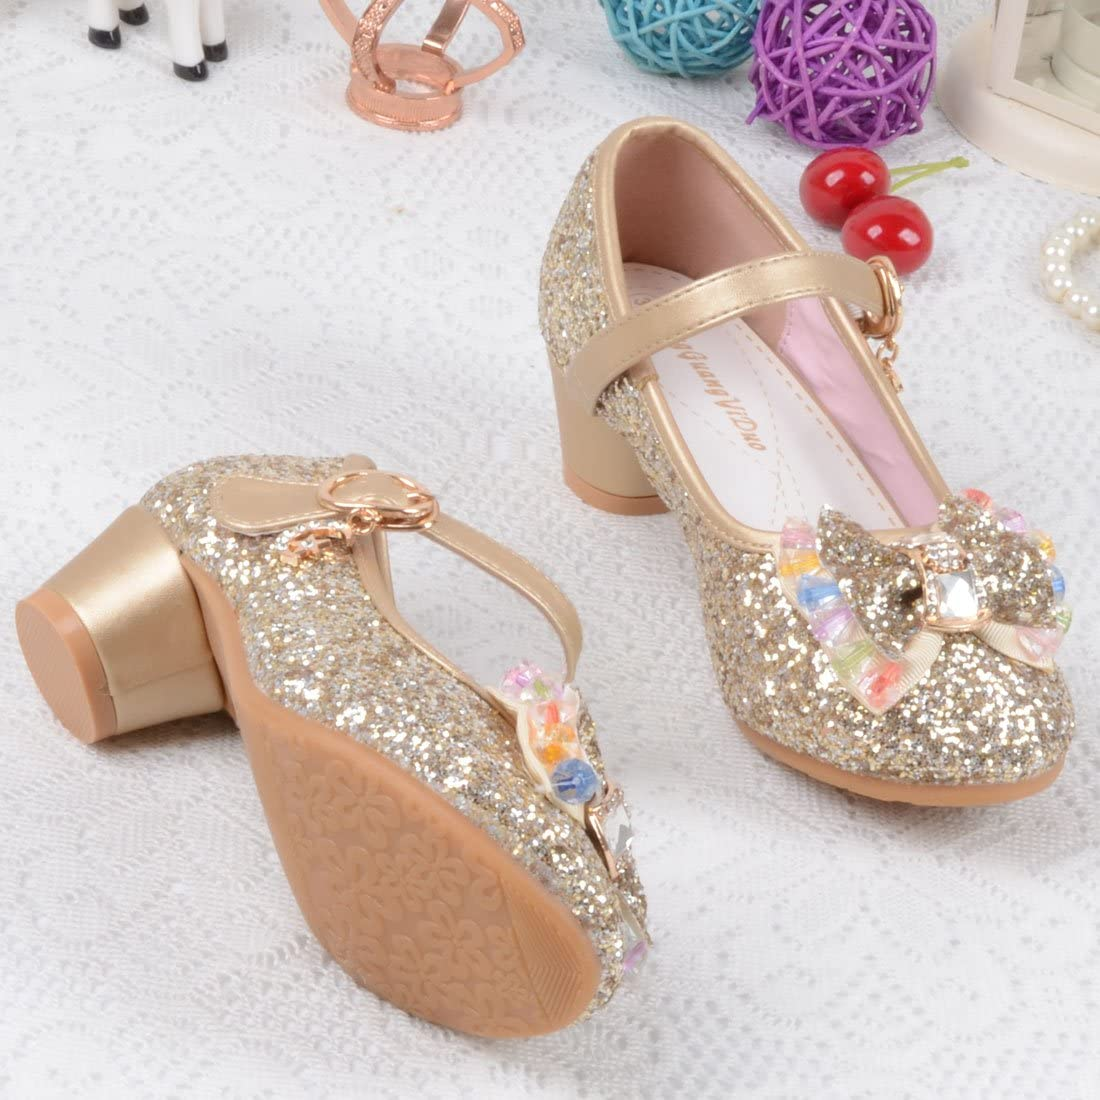 YIBLBOX Kids Girls Mary Jane Wedding Party Shoes Glitter Bridesmaids Low Heels Princess Dress Shoes